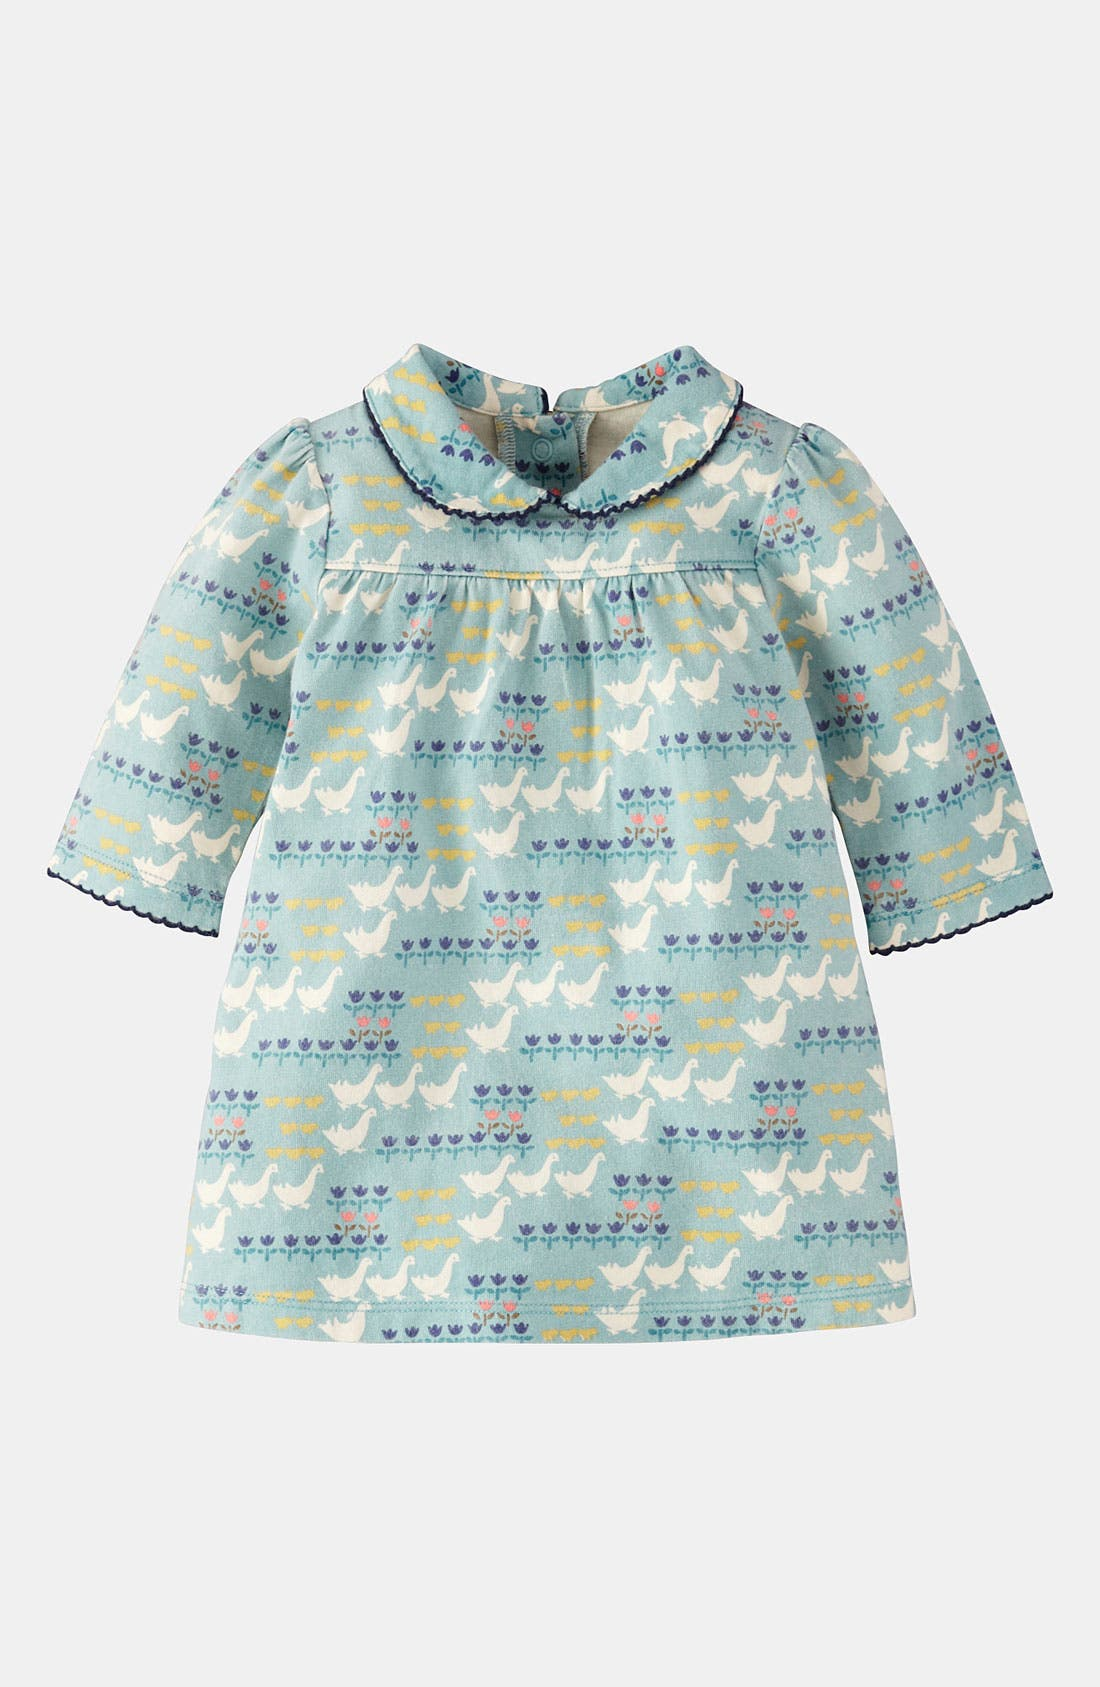 Main Image - Mini Boden 'Pretty' Jersey Dress (Infant)